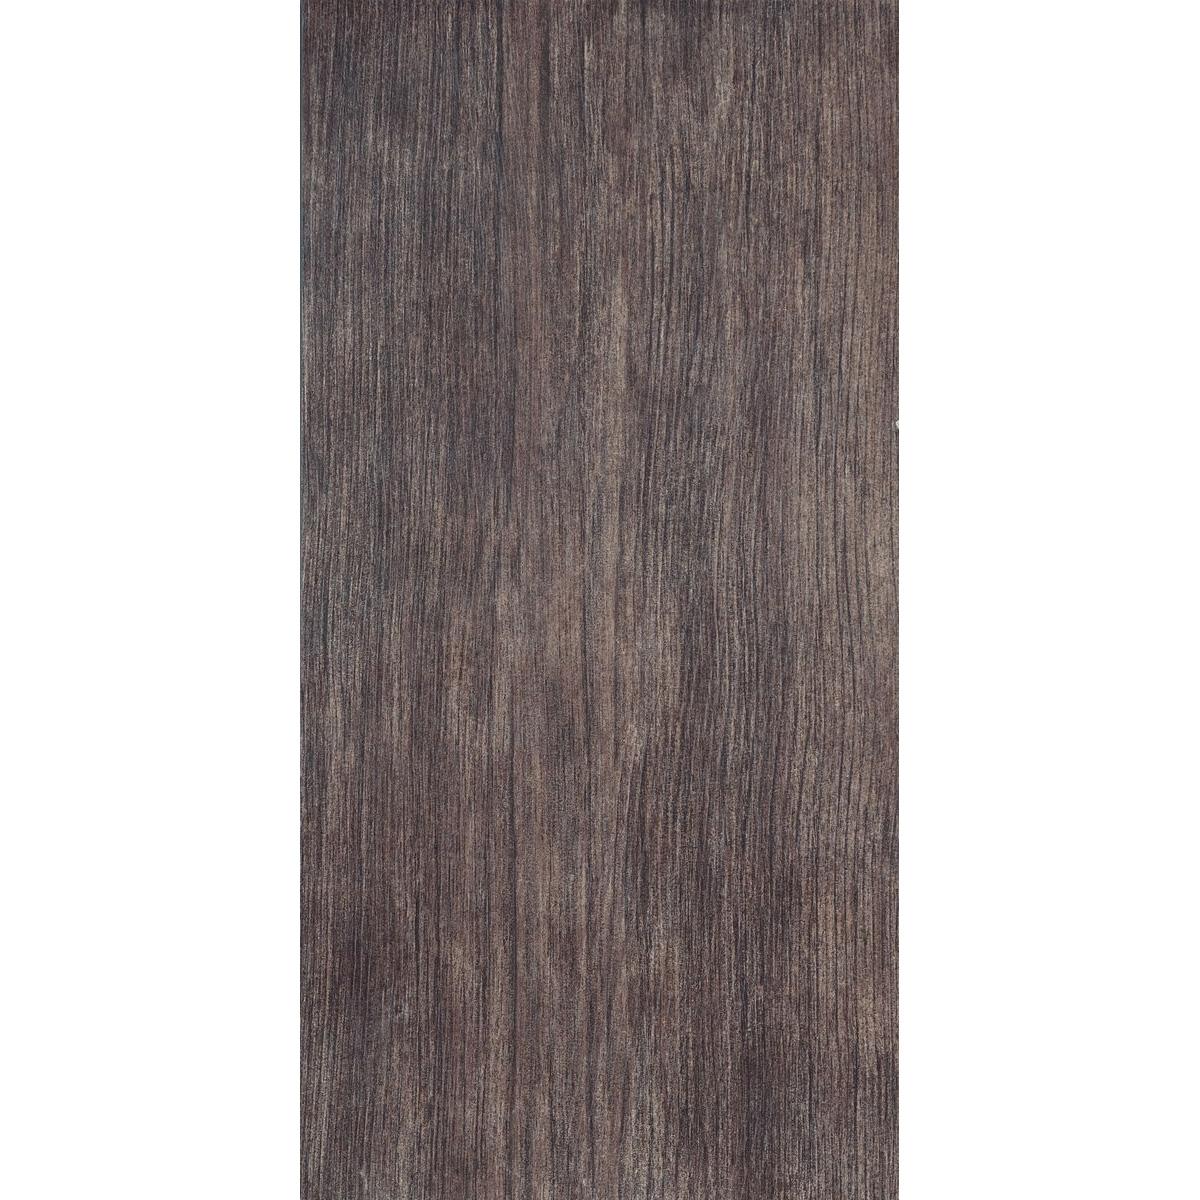 Brown   30x60 (znxpt6r) изображение 0